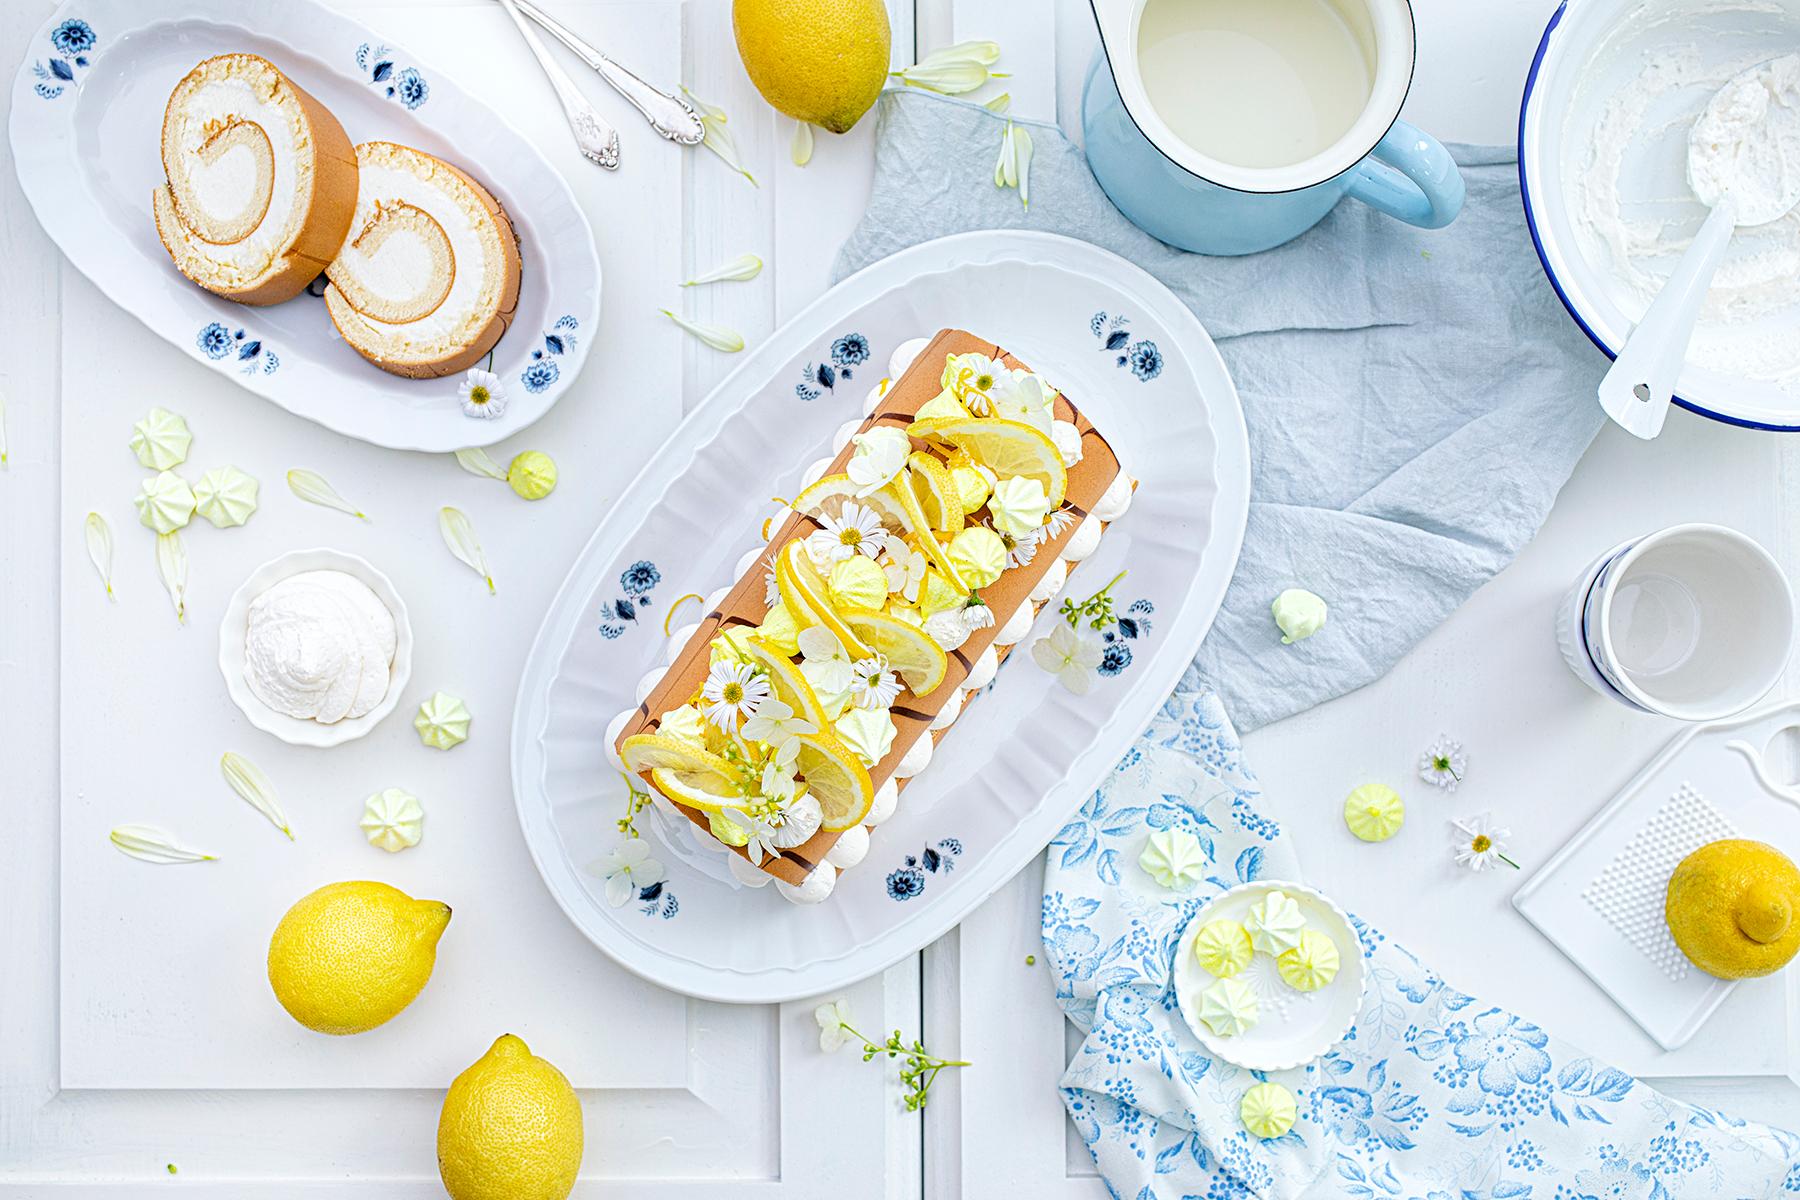 Zitronen-Sahne-Rolle im Sommerlook